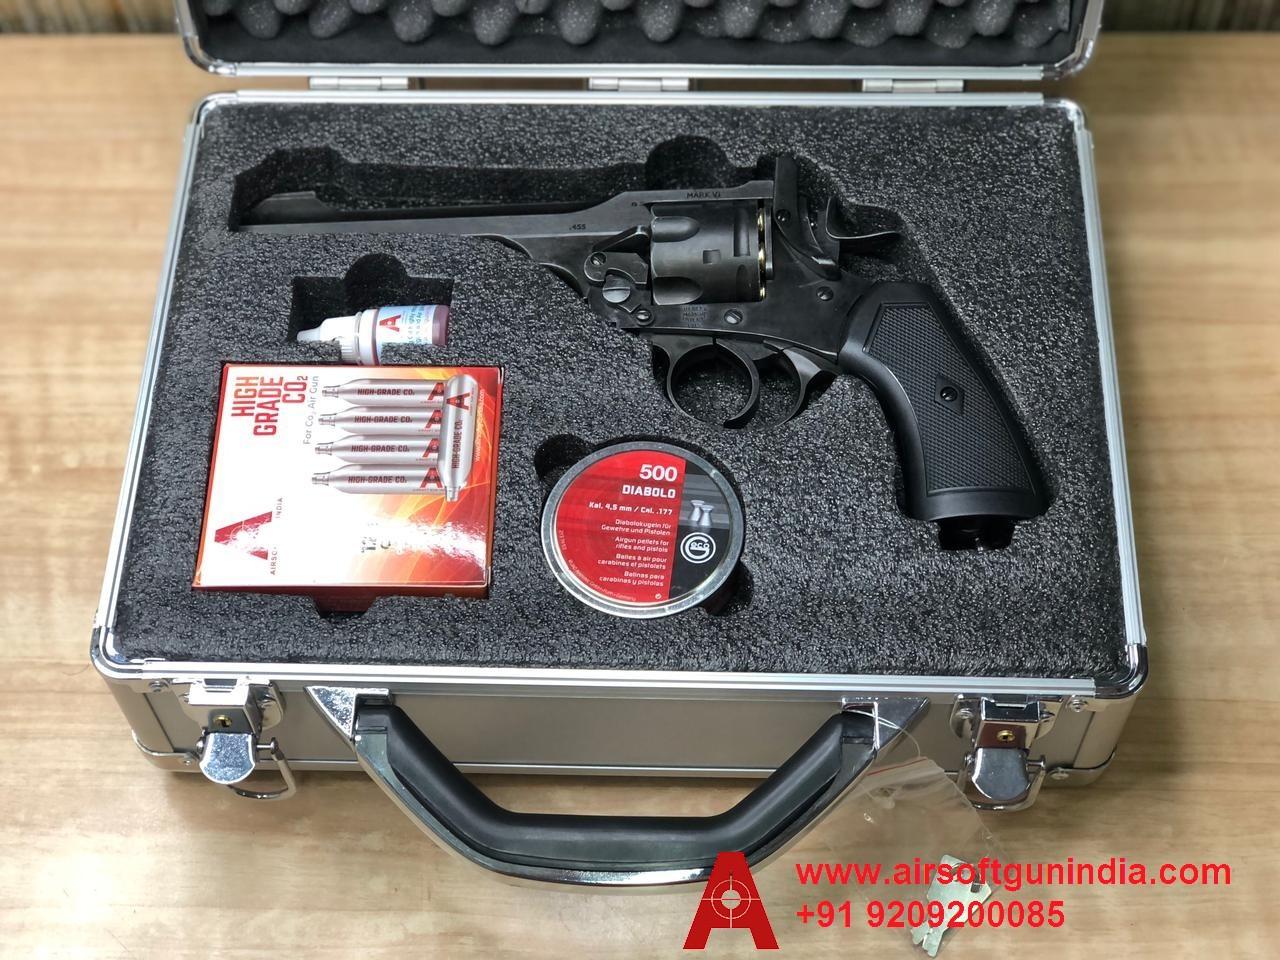 Customized Storage Gun Box For Webley MKVI Co2 Pellet Revolver  By Airsoft Gun India